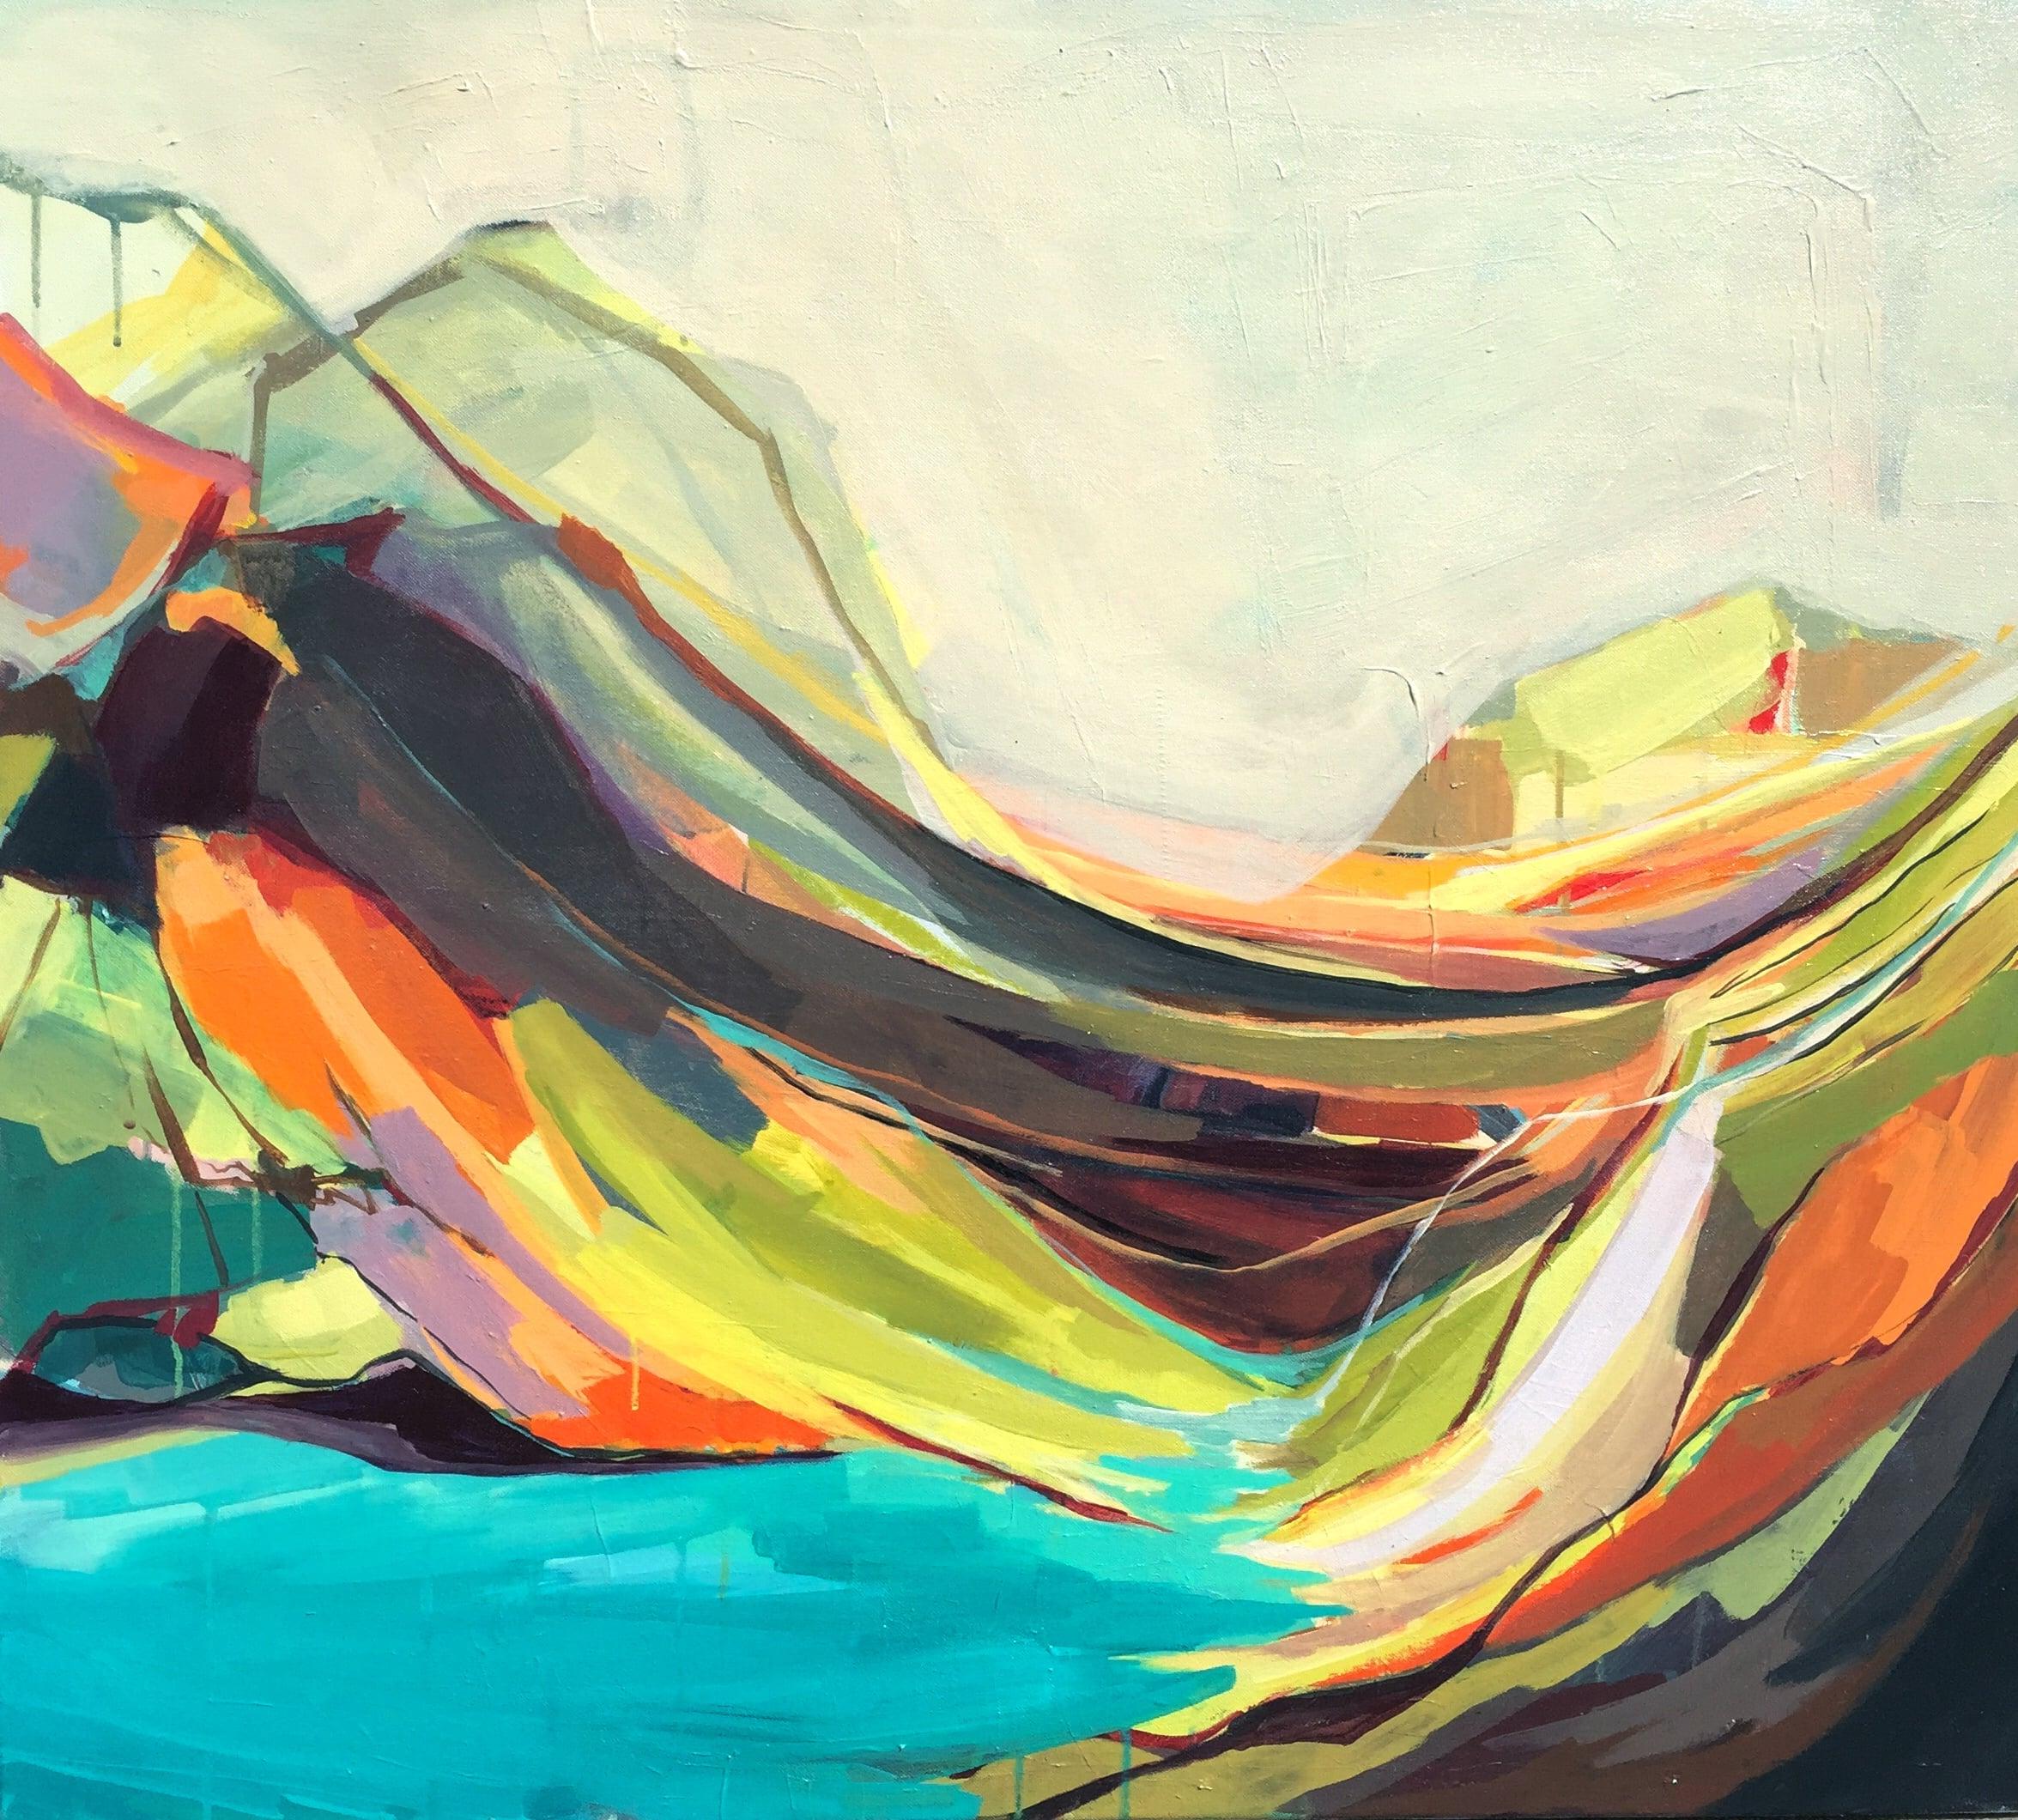 """Mount Desert Isle,"" Amanda Hawkins, Acrylic on canvas.34x36 in.  Photo courtesy of http://www.amandakhawkins.com/"